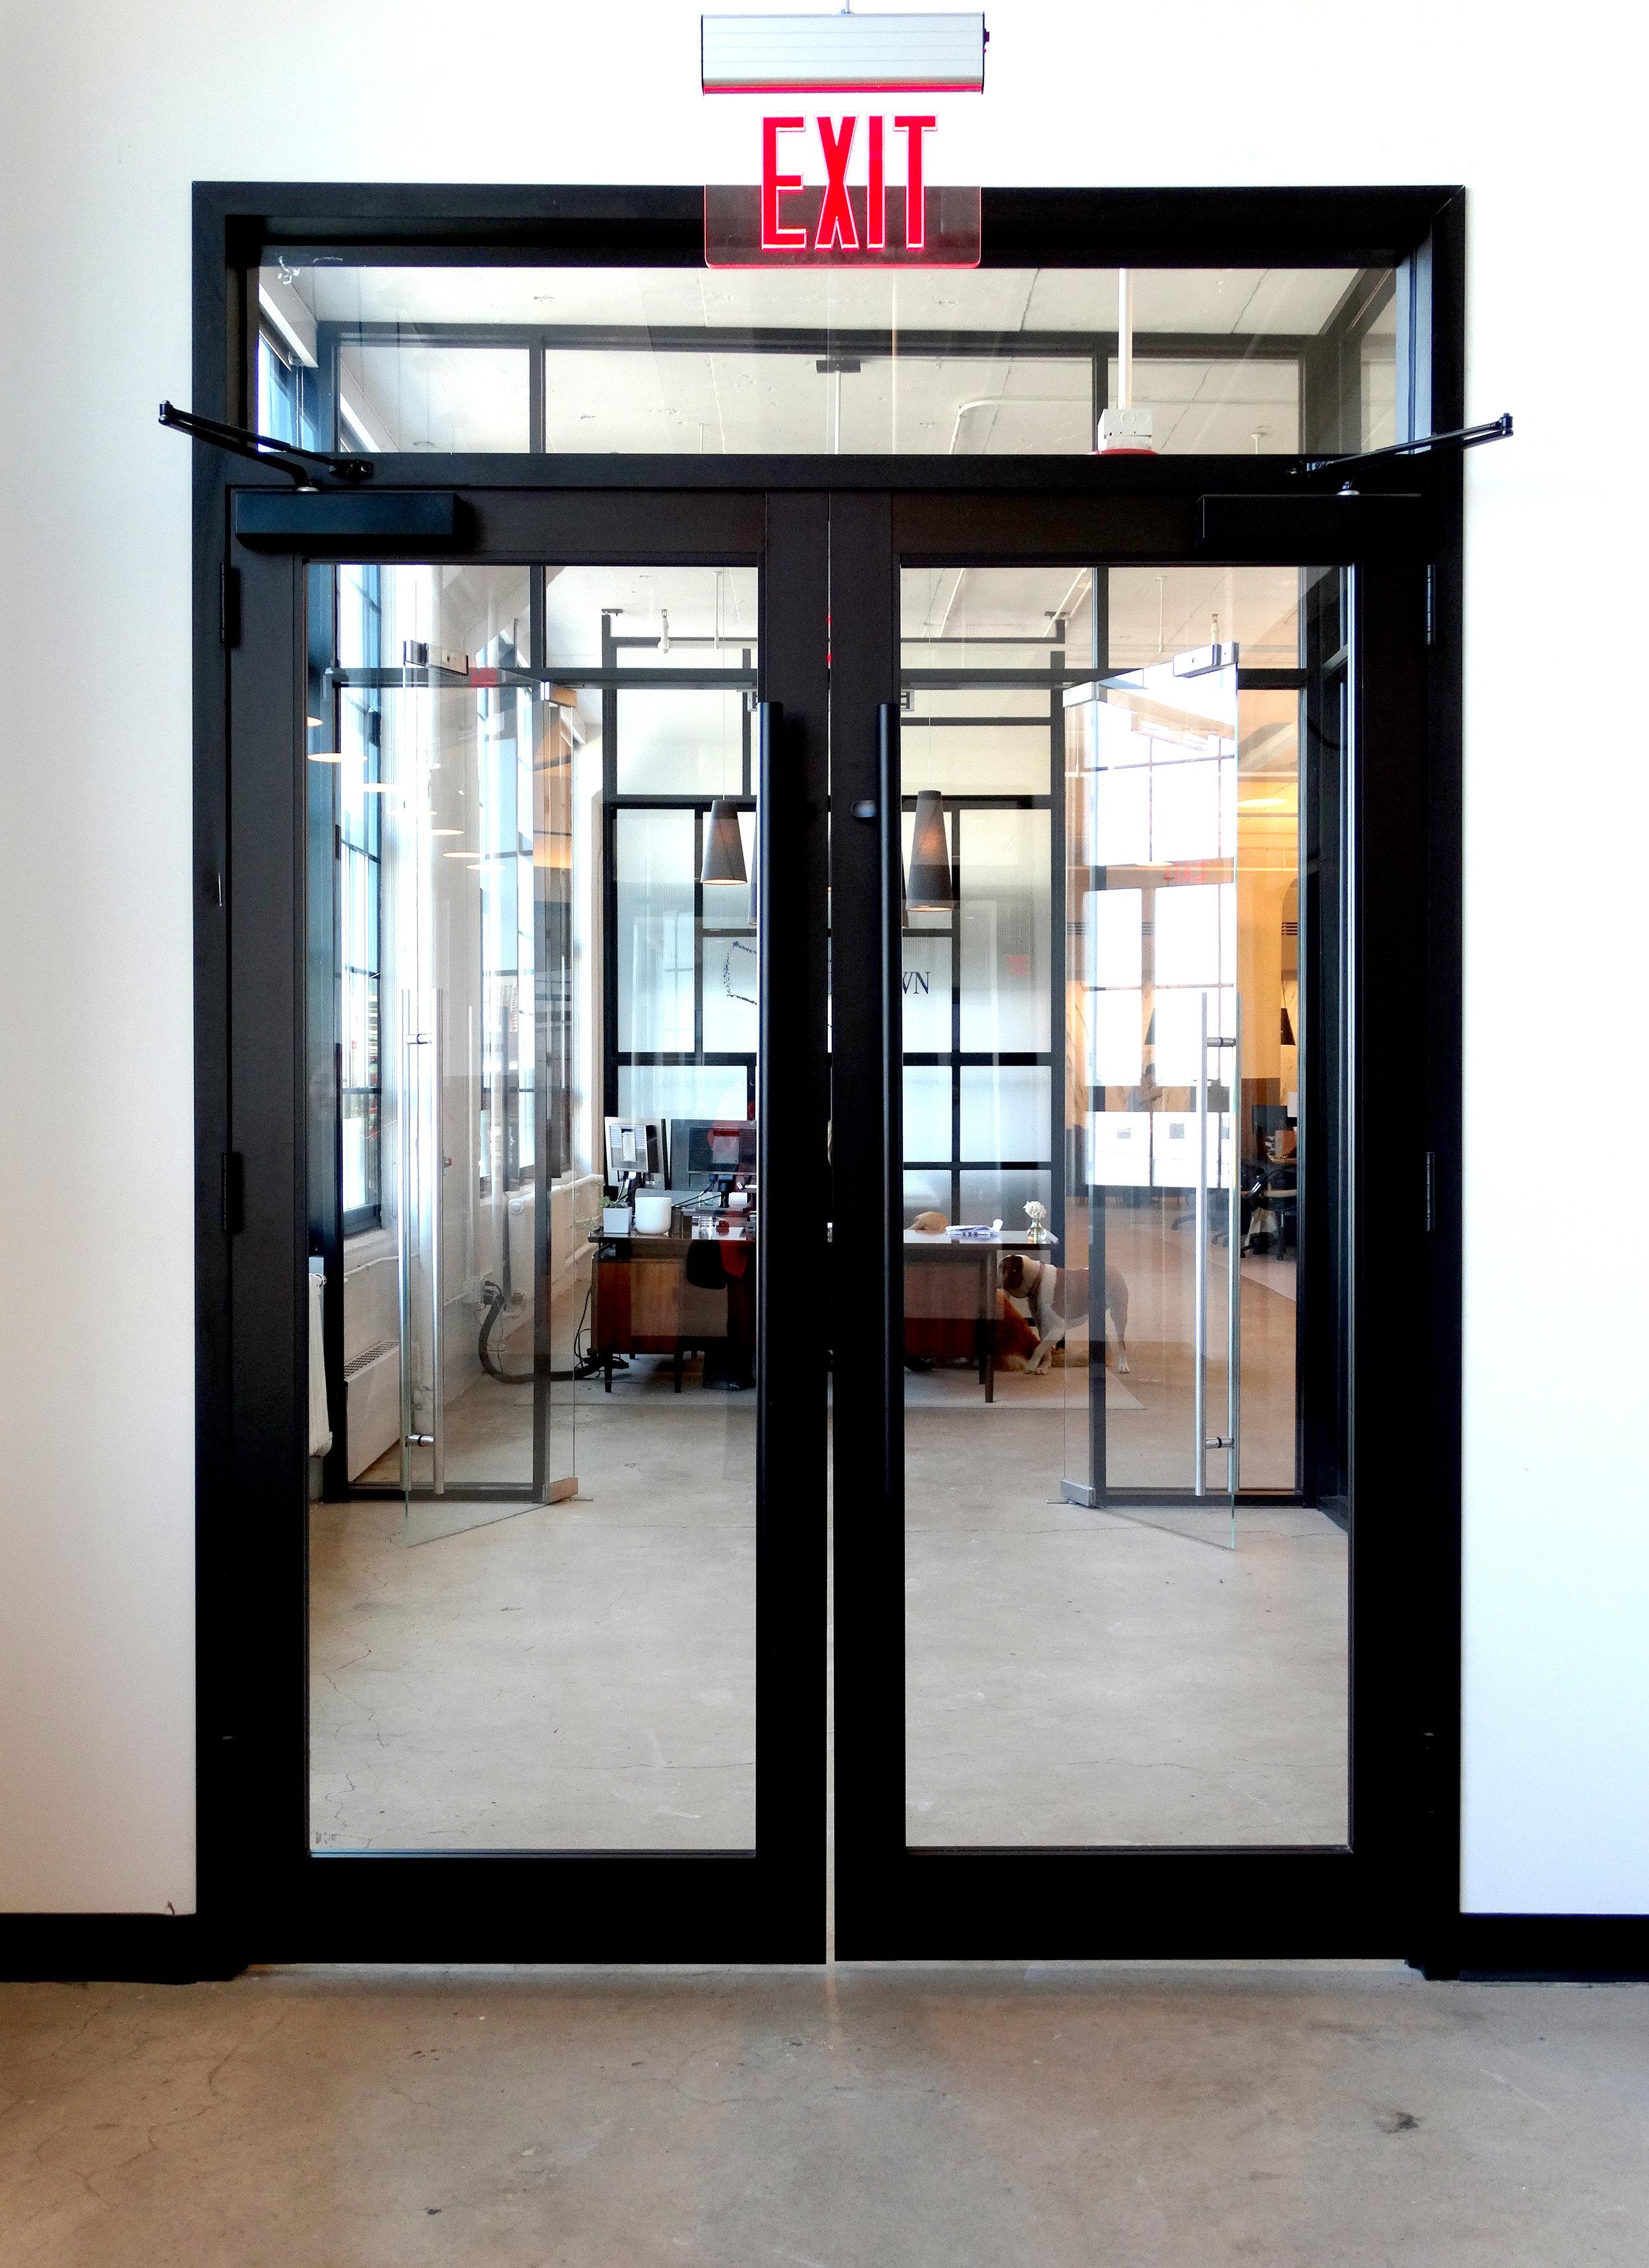 Encase Black Anodized Entry Doors - Spaceworks AI.jpg